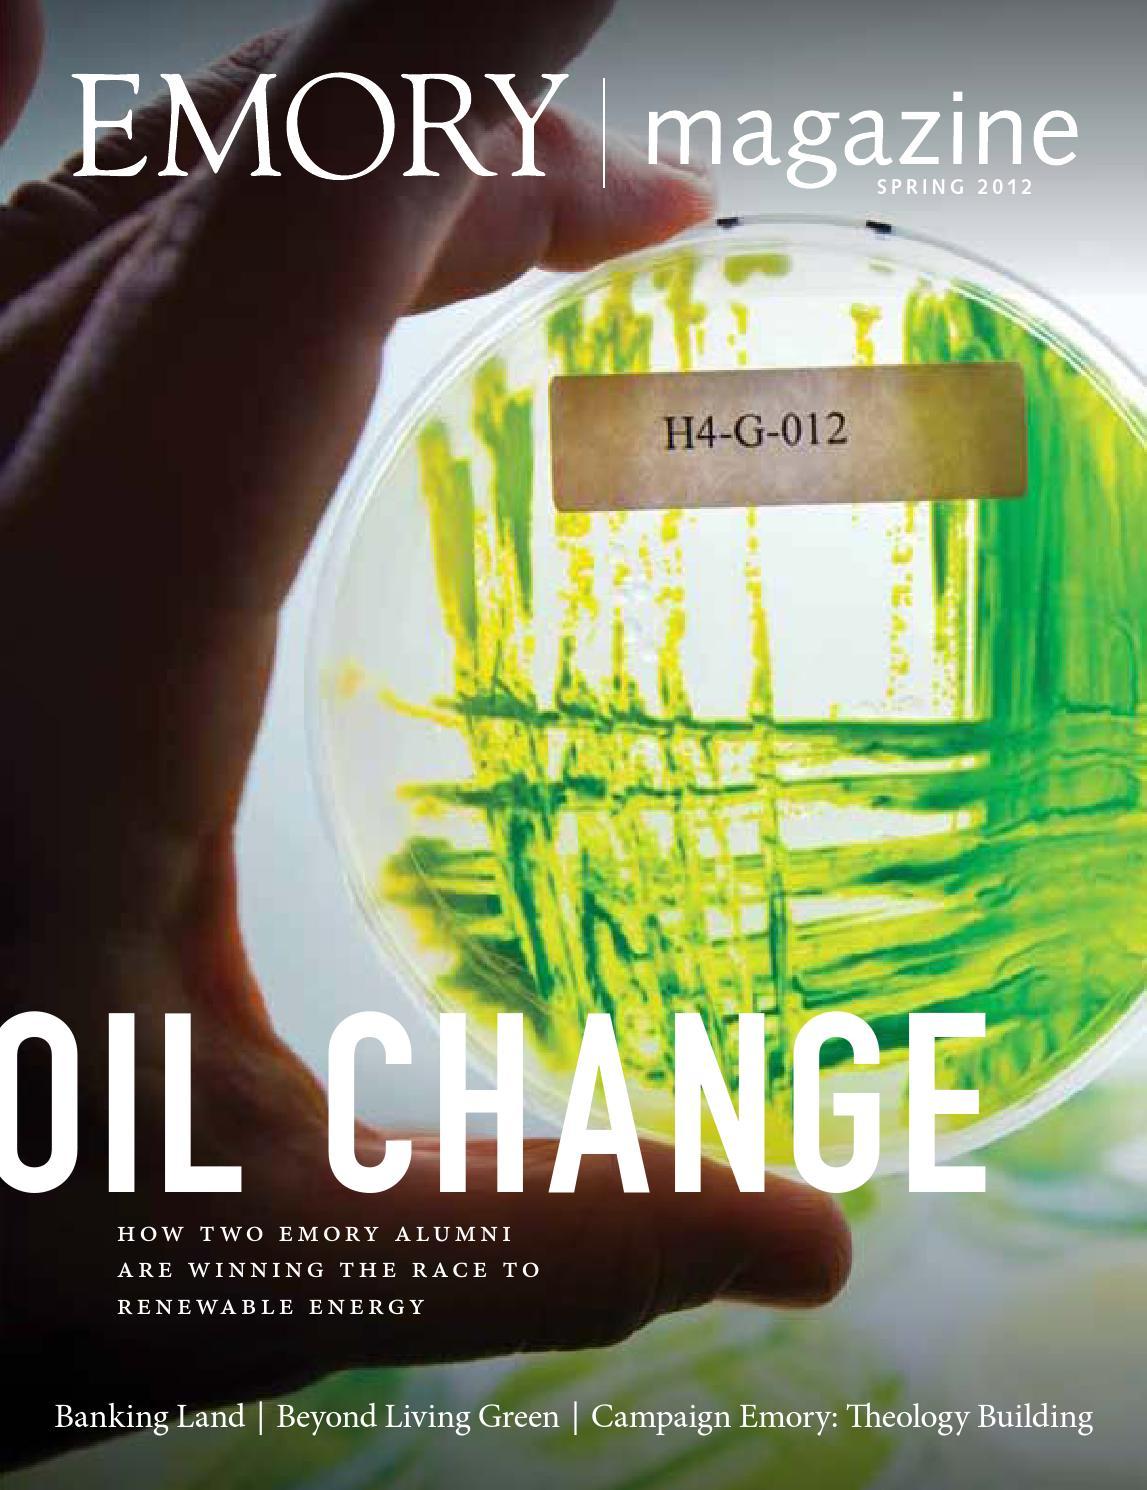 Emory Magazine / Spring 2012 by Emory University - issuu